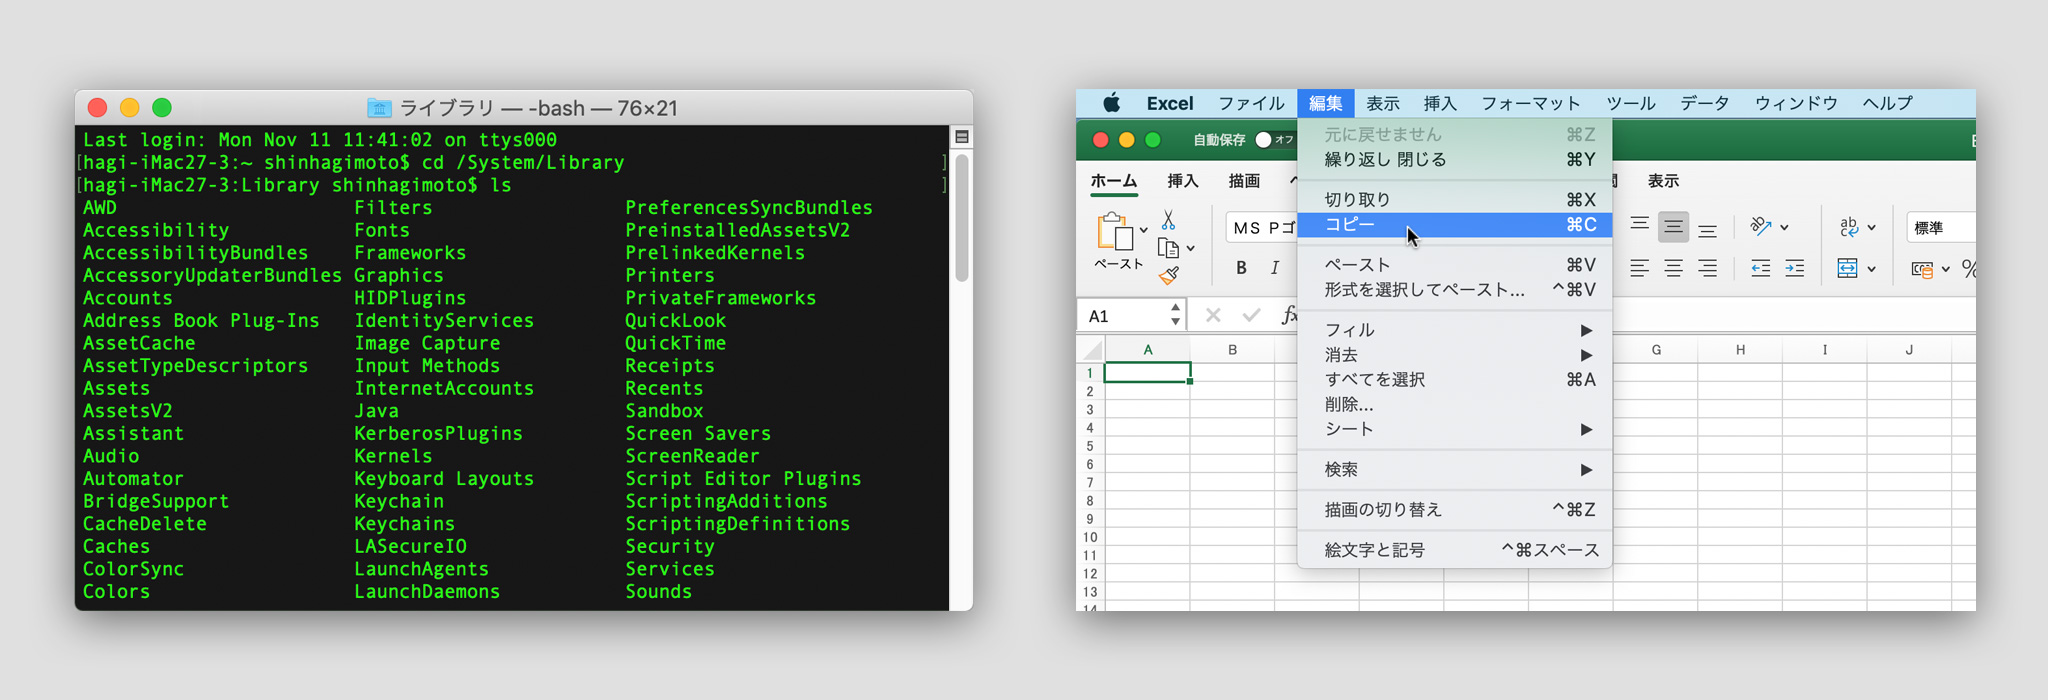 CUIの例とGUIのメニューの例